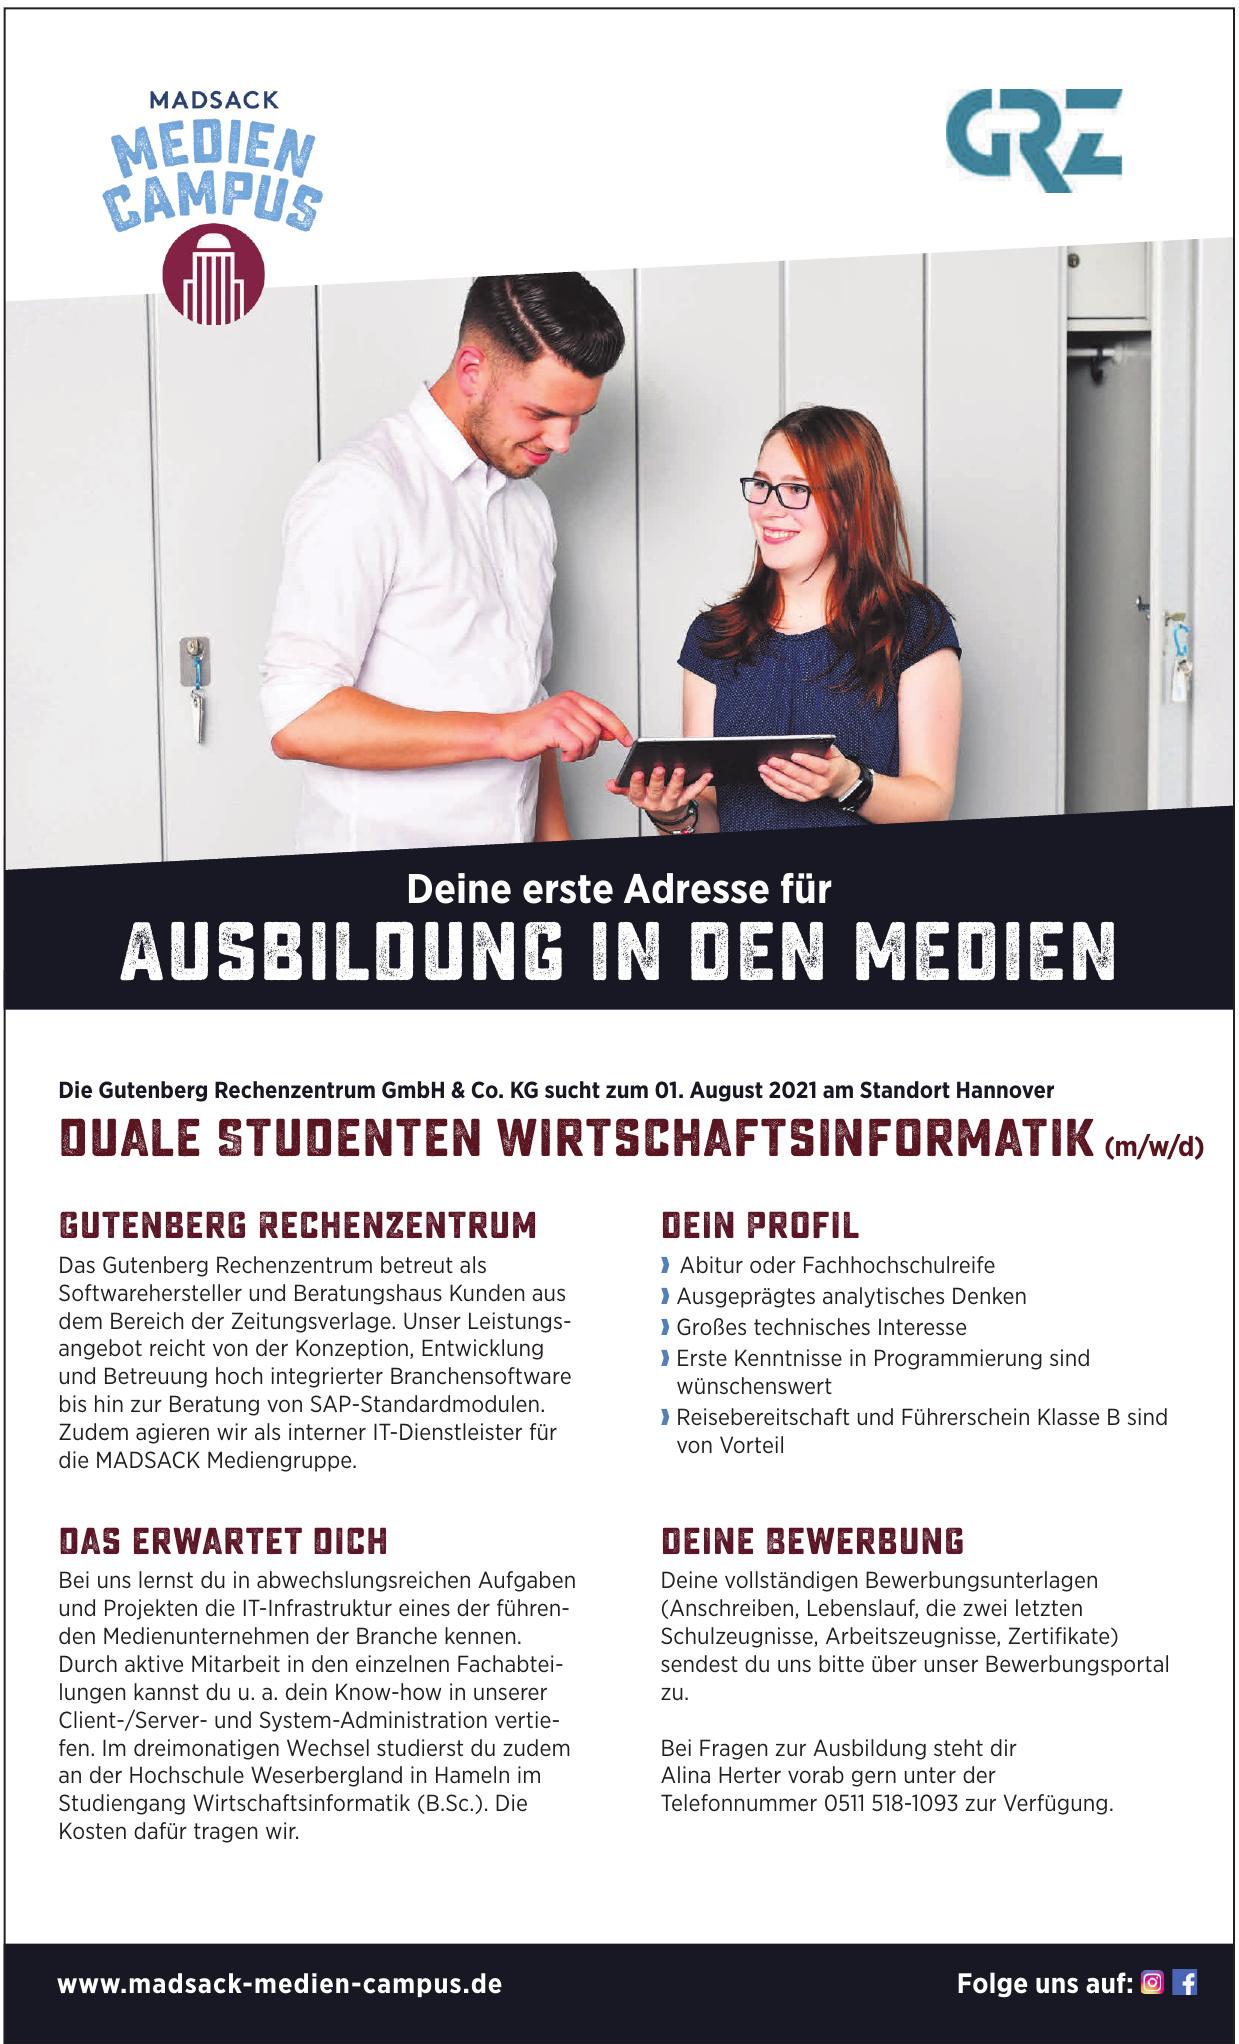 Madsack Medien Campus GmbH & Co. KG